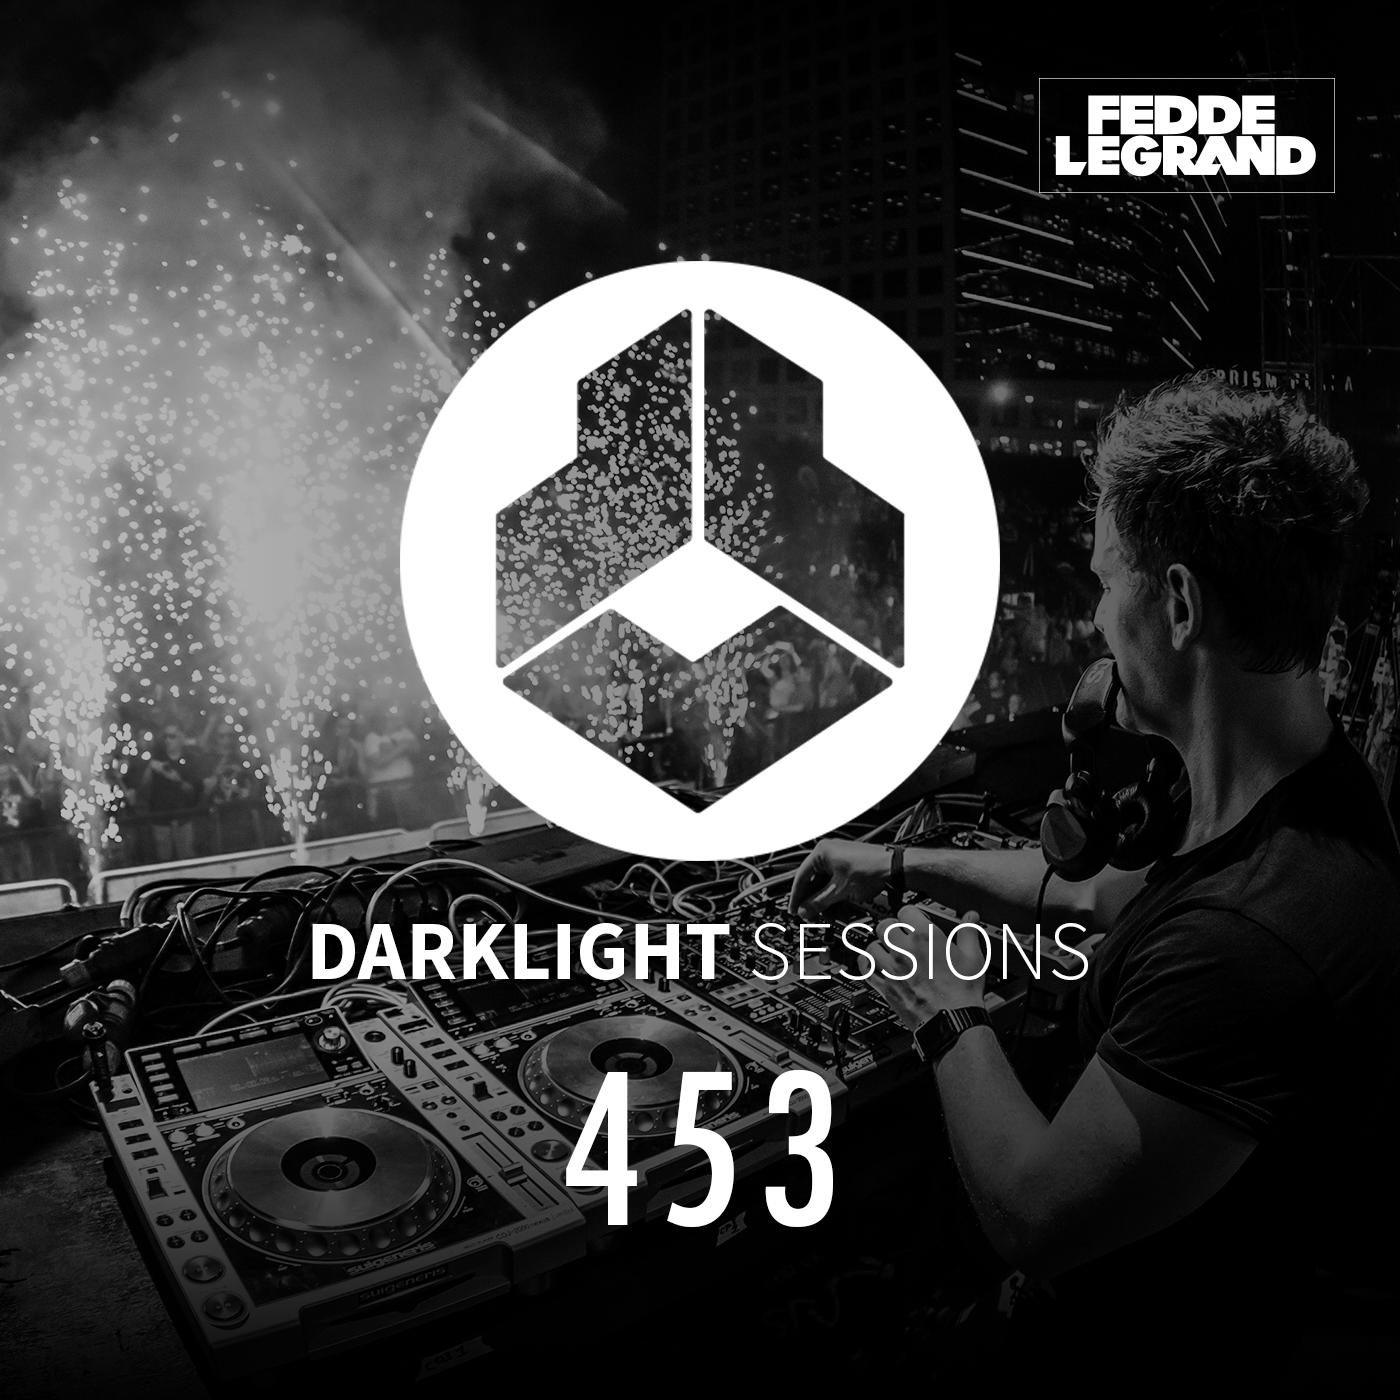 Darklight Sessions 453